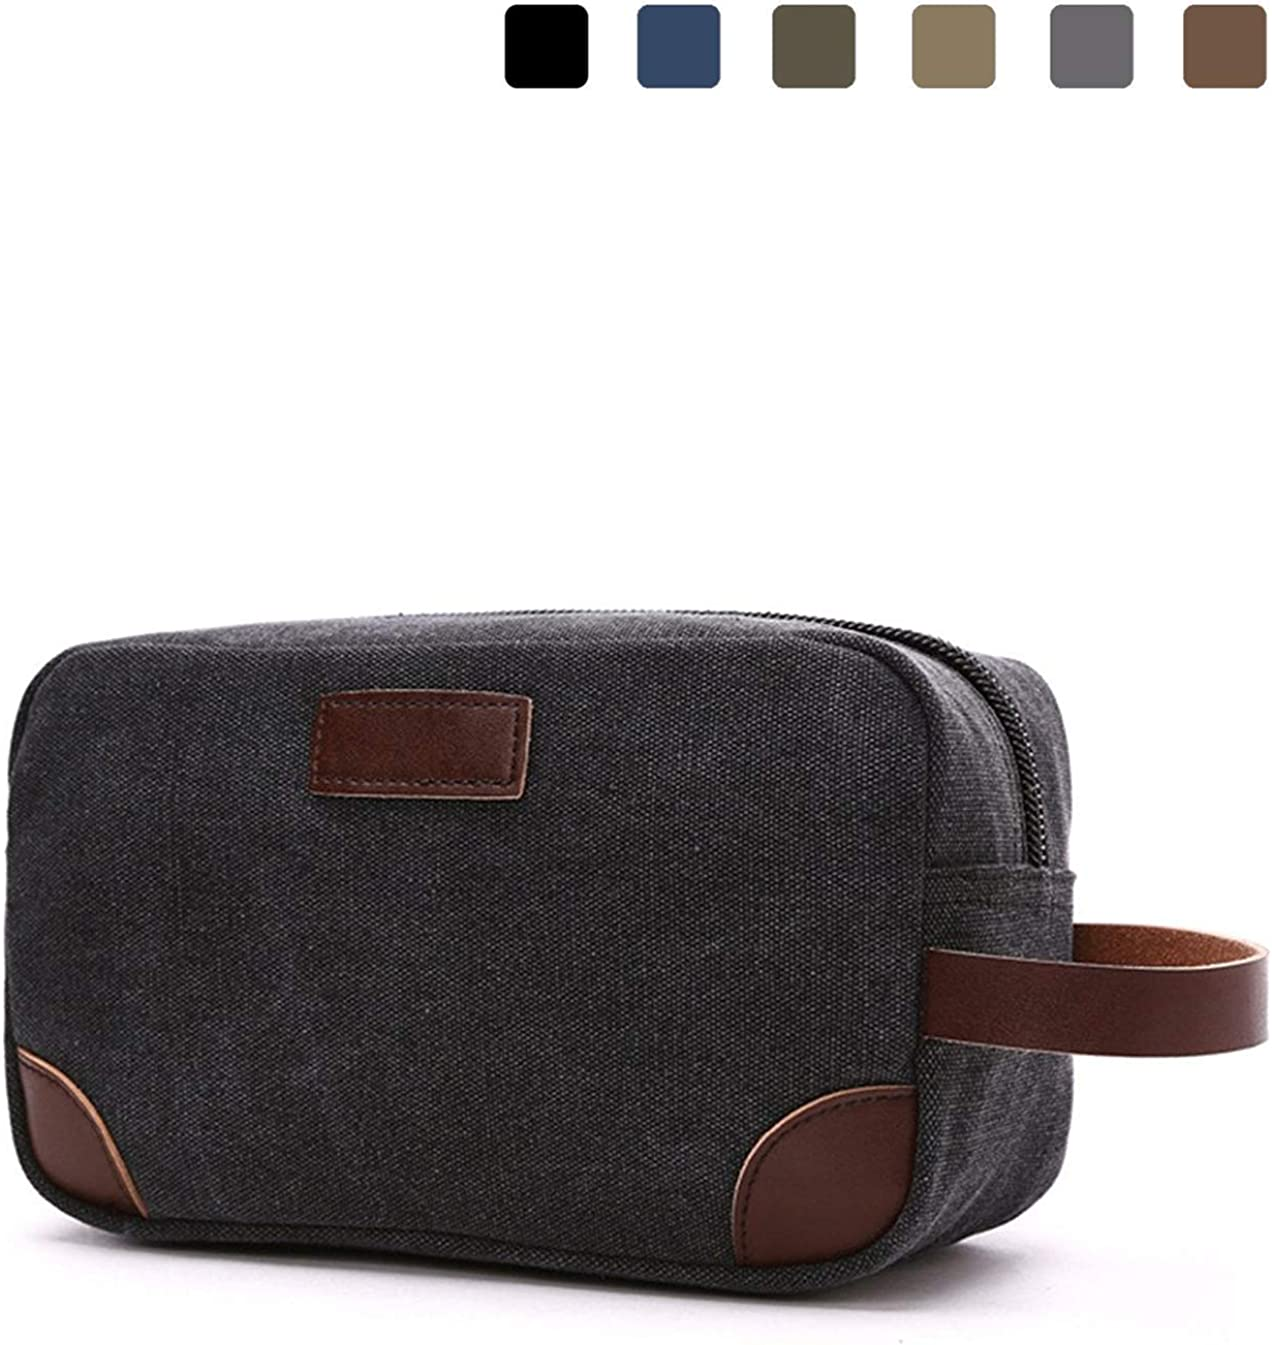 Lanivas Canvas Travel Toiletry Bag Vintage Shaving Dopp Kit with Leather Handle